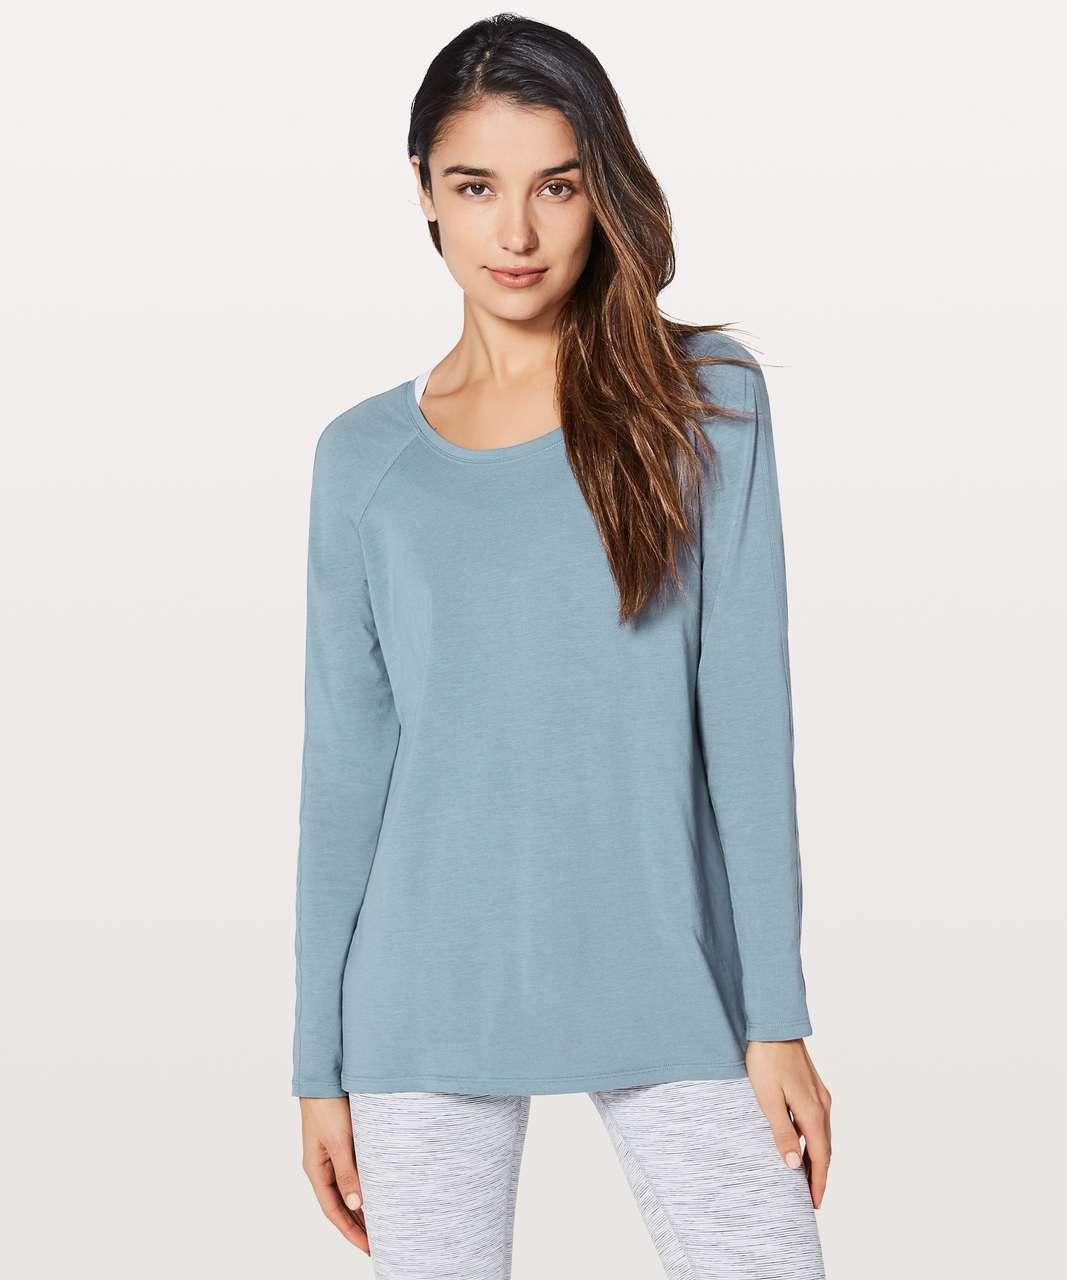 Lululemon Emerald Long Sleeve - Blue Denim